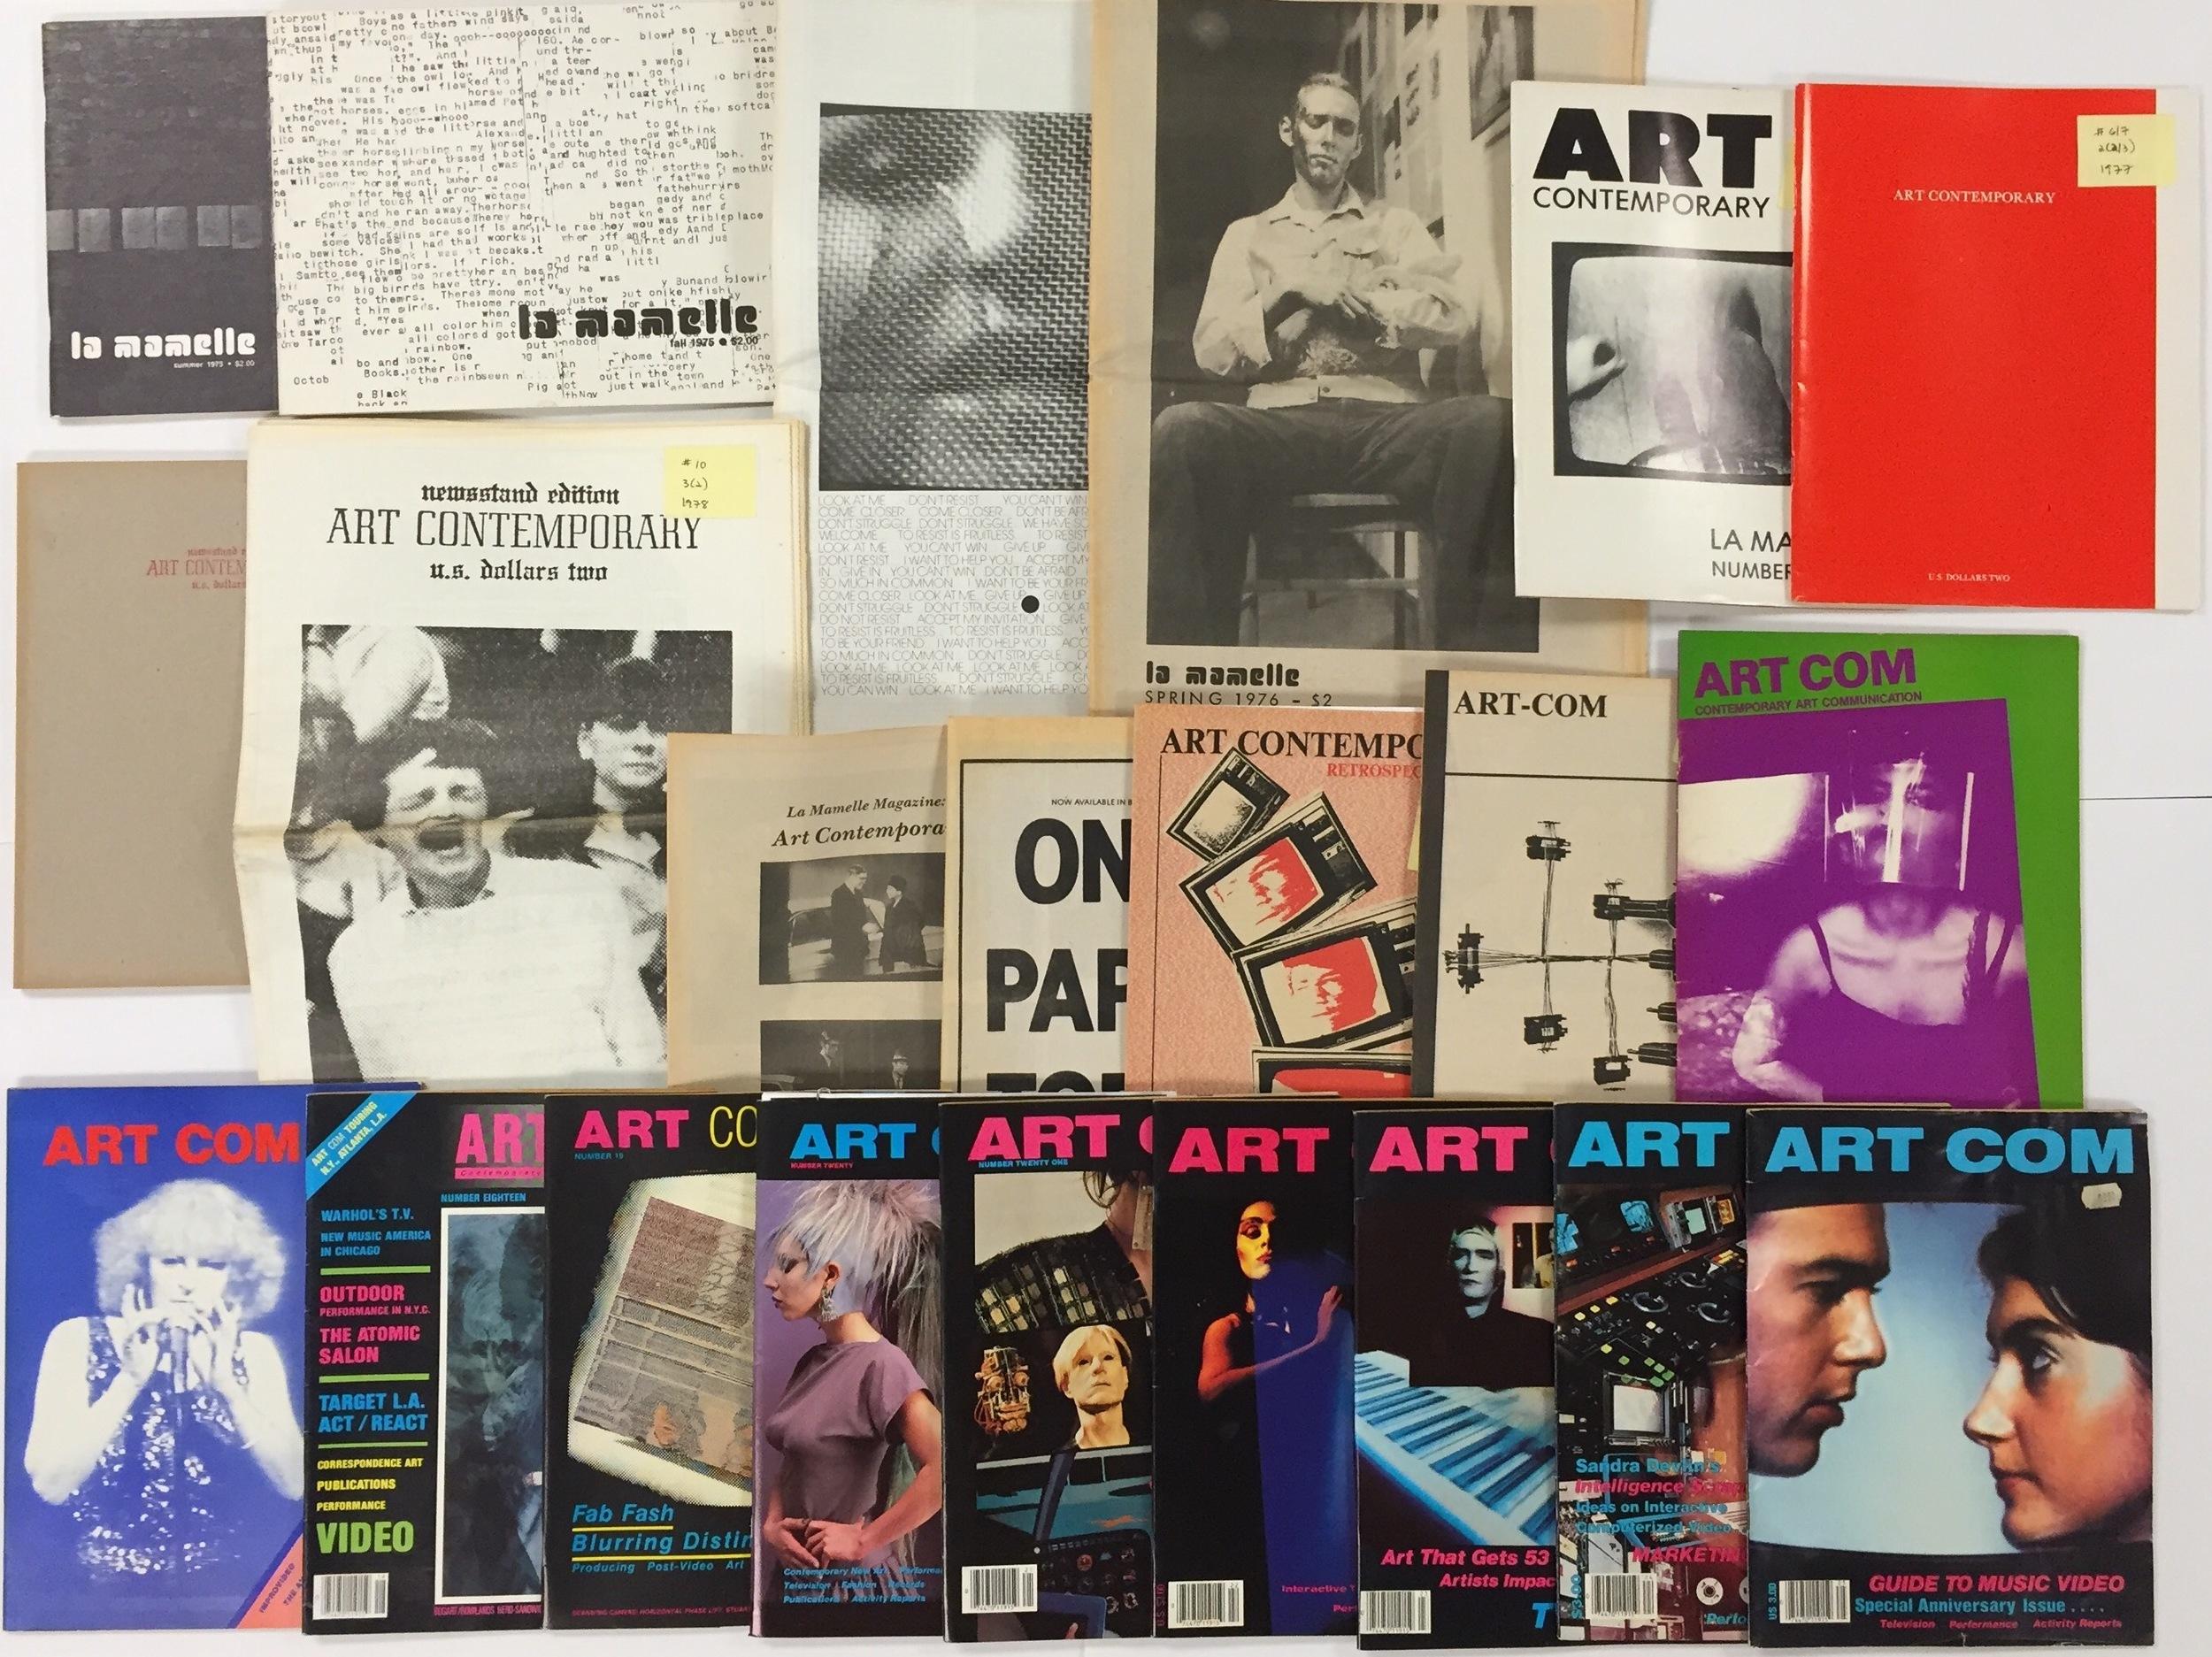 La Mamelle / Art Contemporary / Artcom Magazines